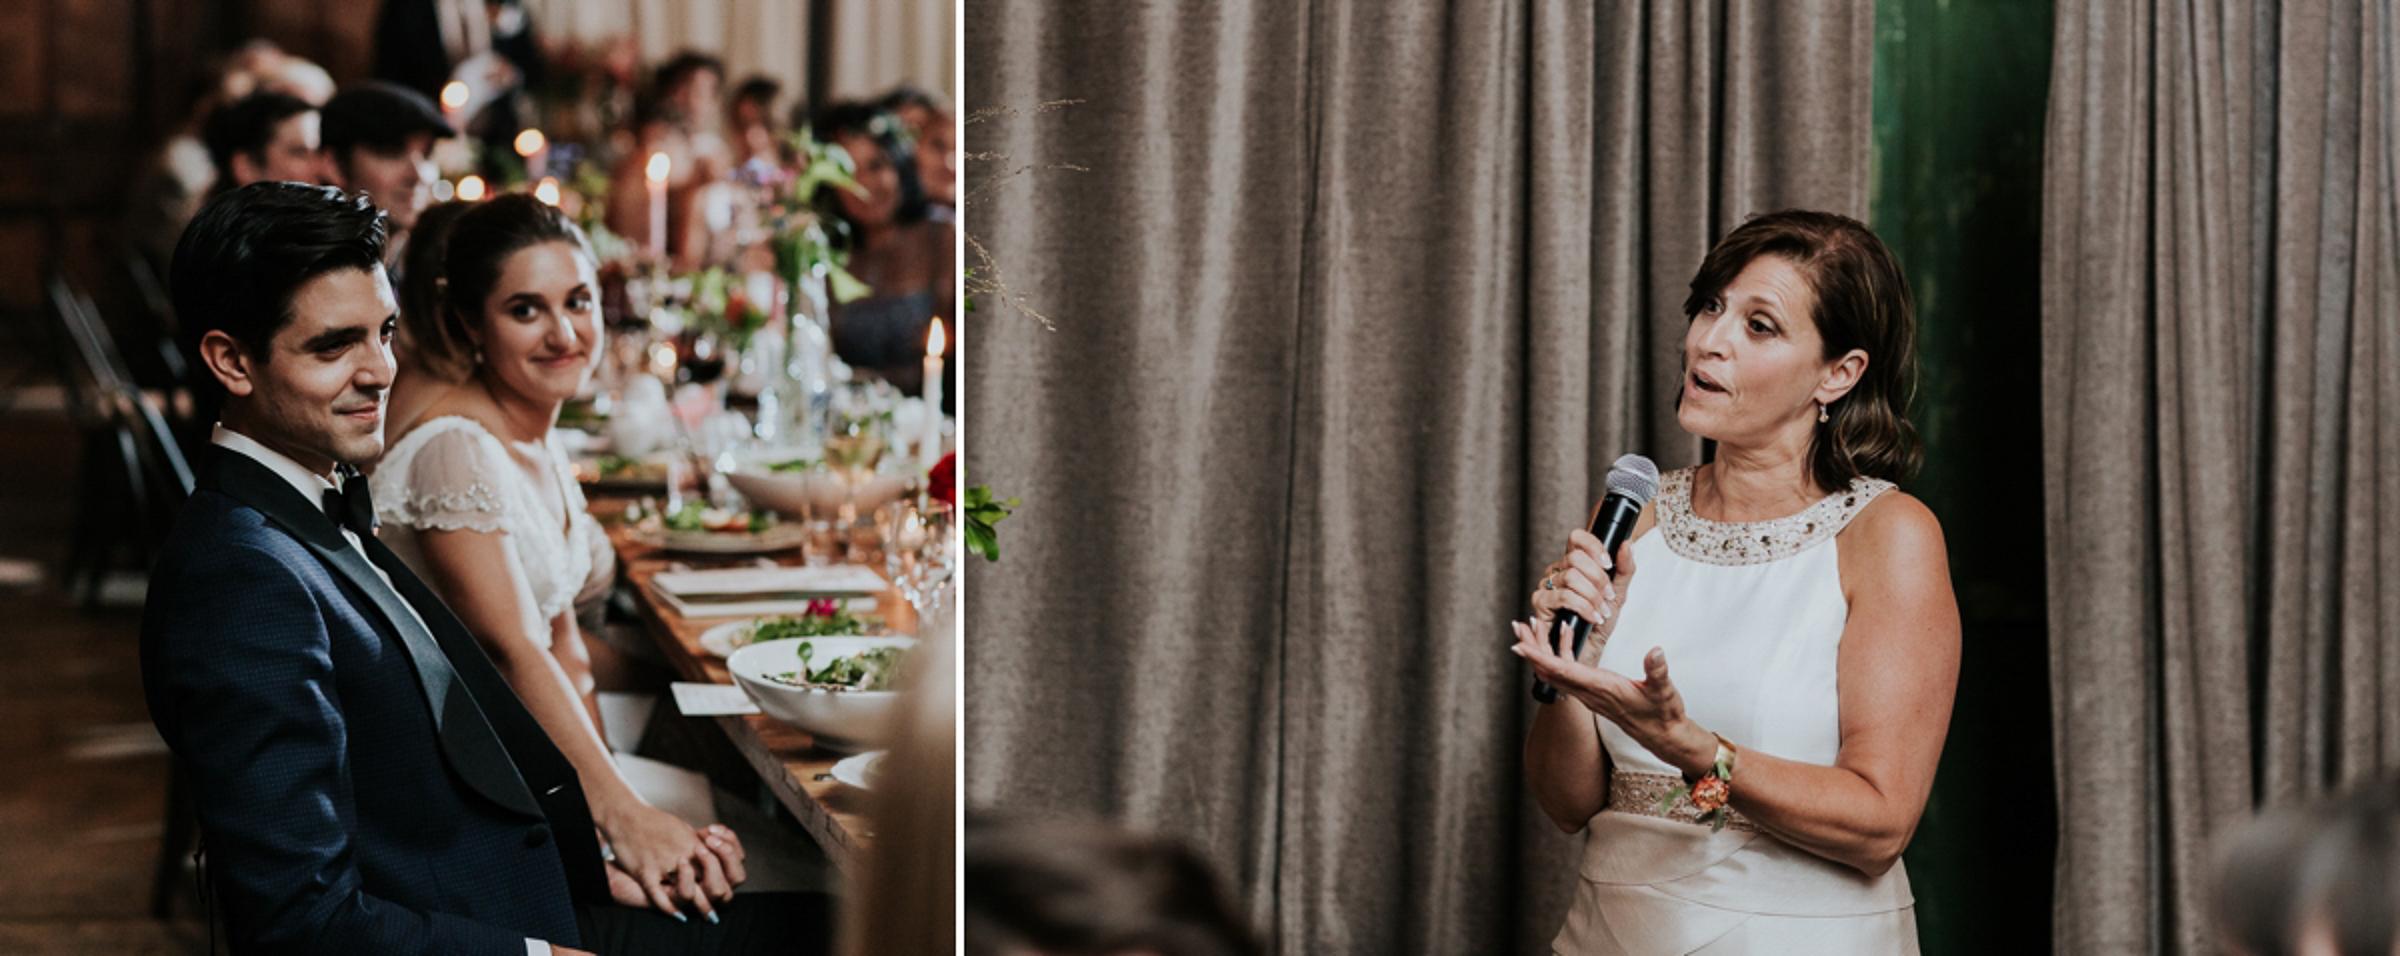 Brooklyn-Winery-NYC-Editorial-Documentary-Wedding-Photographer-Gina-Oli-132.jpg